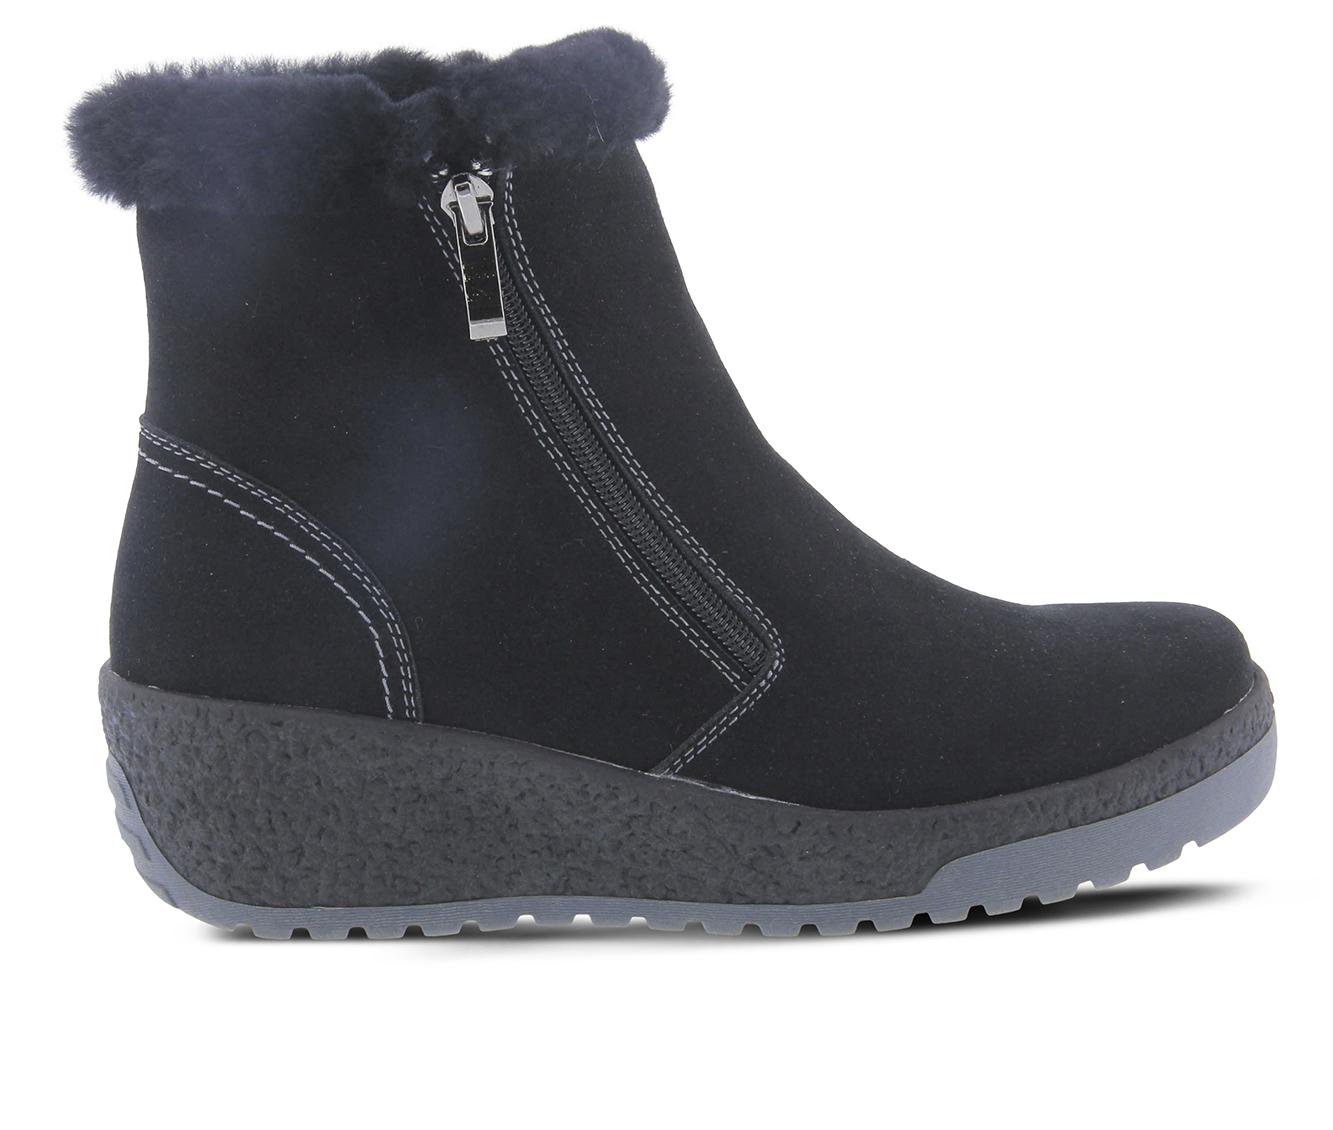 SPRING STEP Lambi Women's Boots (Black - Size EU 39 / US 8.5)